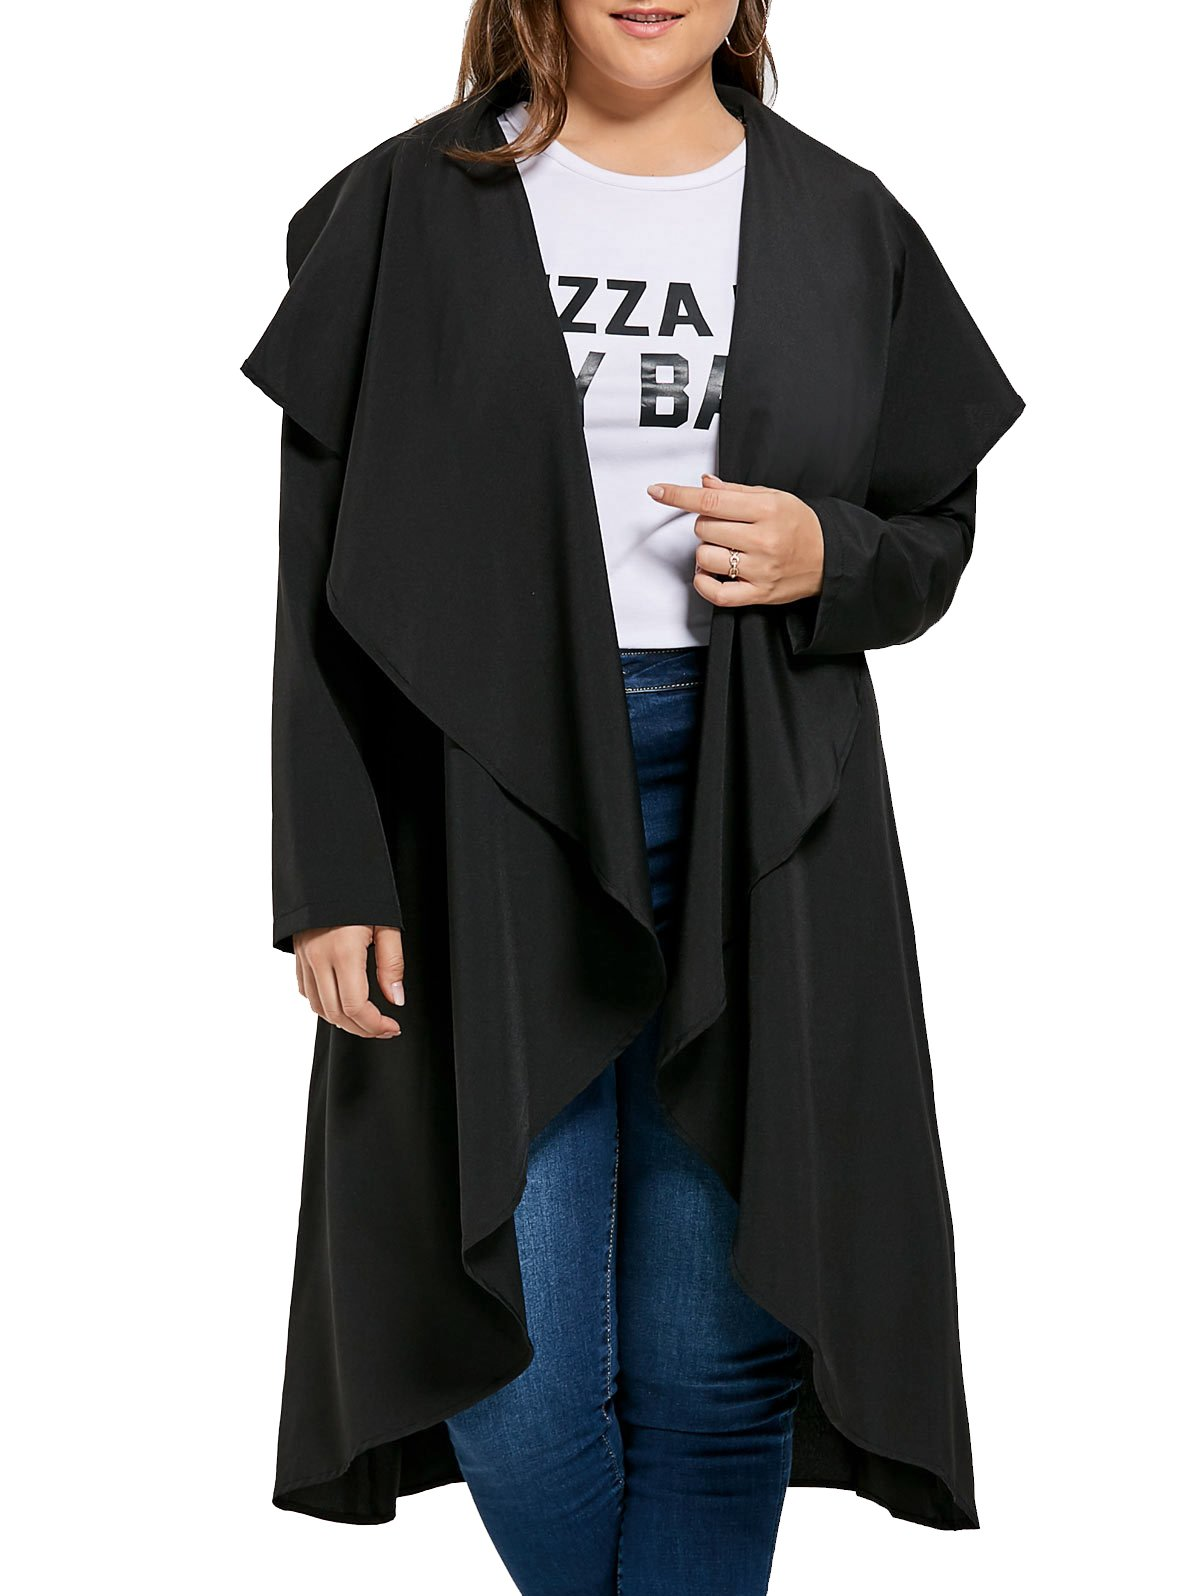 Simplee Plus Women's Long Sleeve Lightweight Thin Casual Drap Cardigan Coat